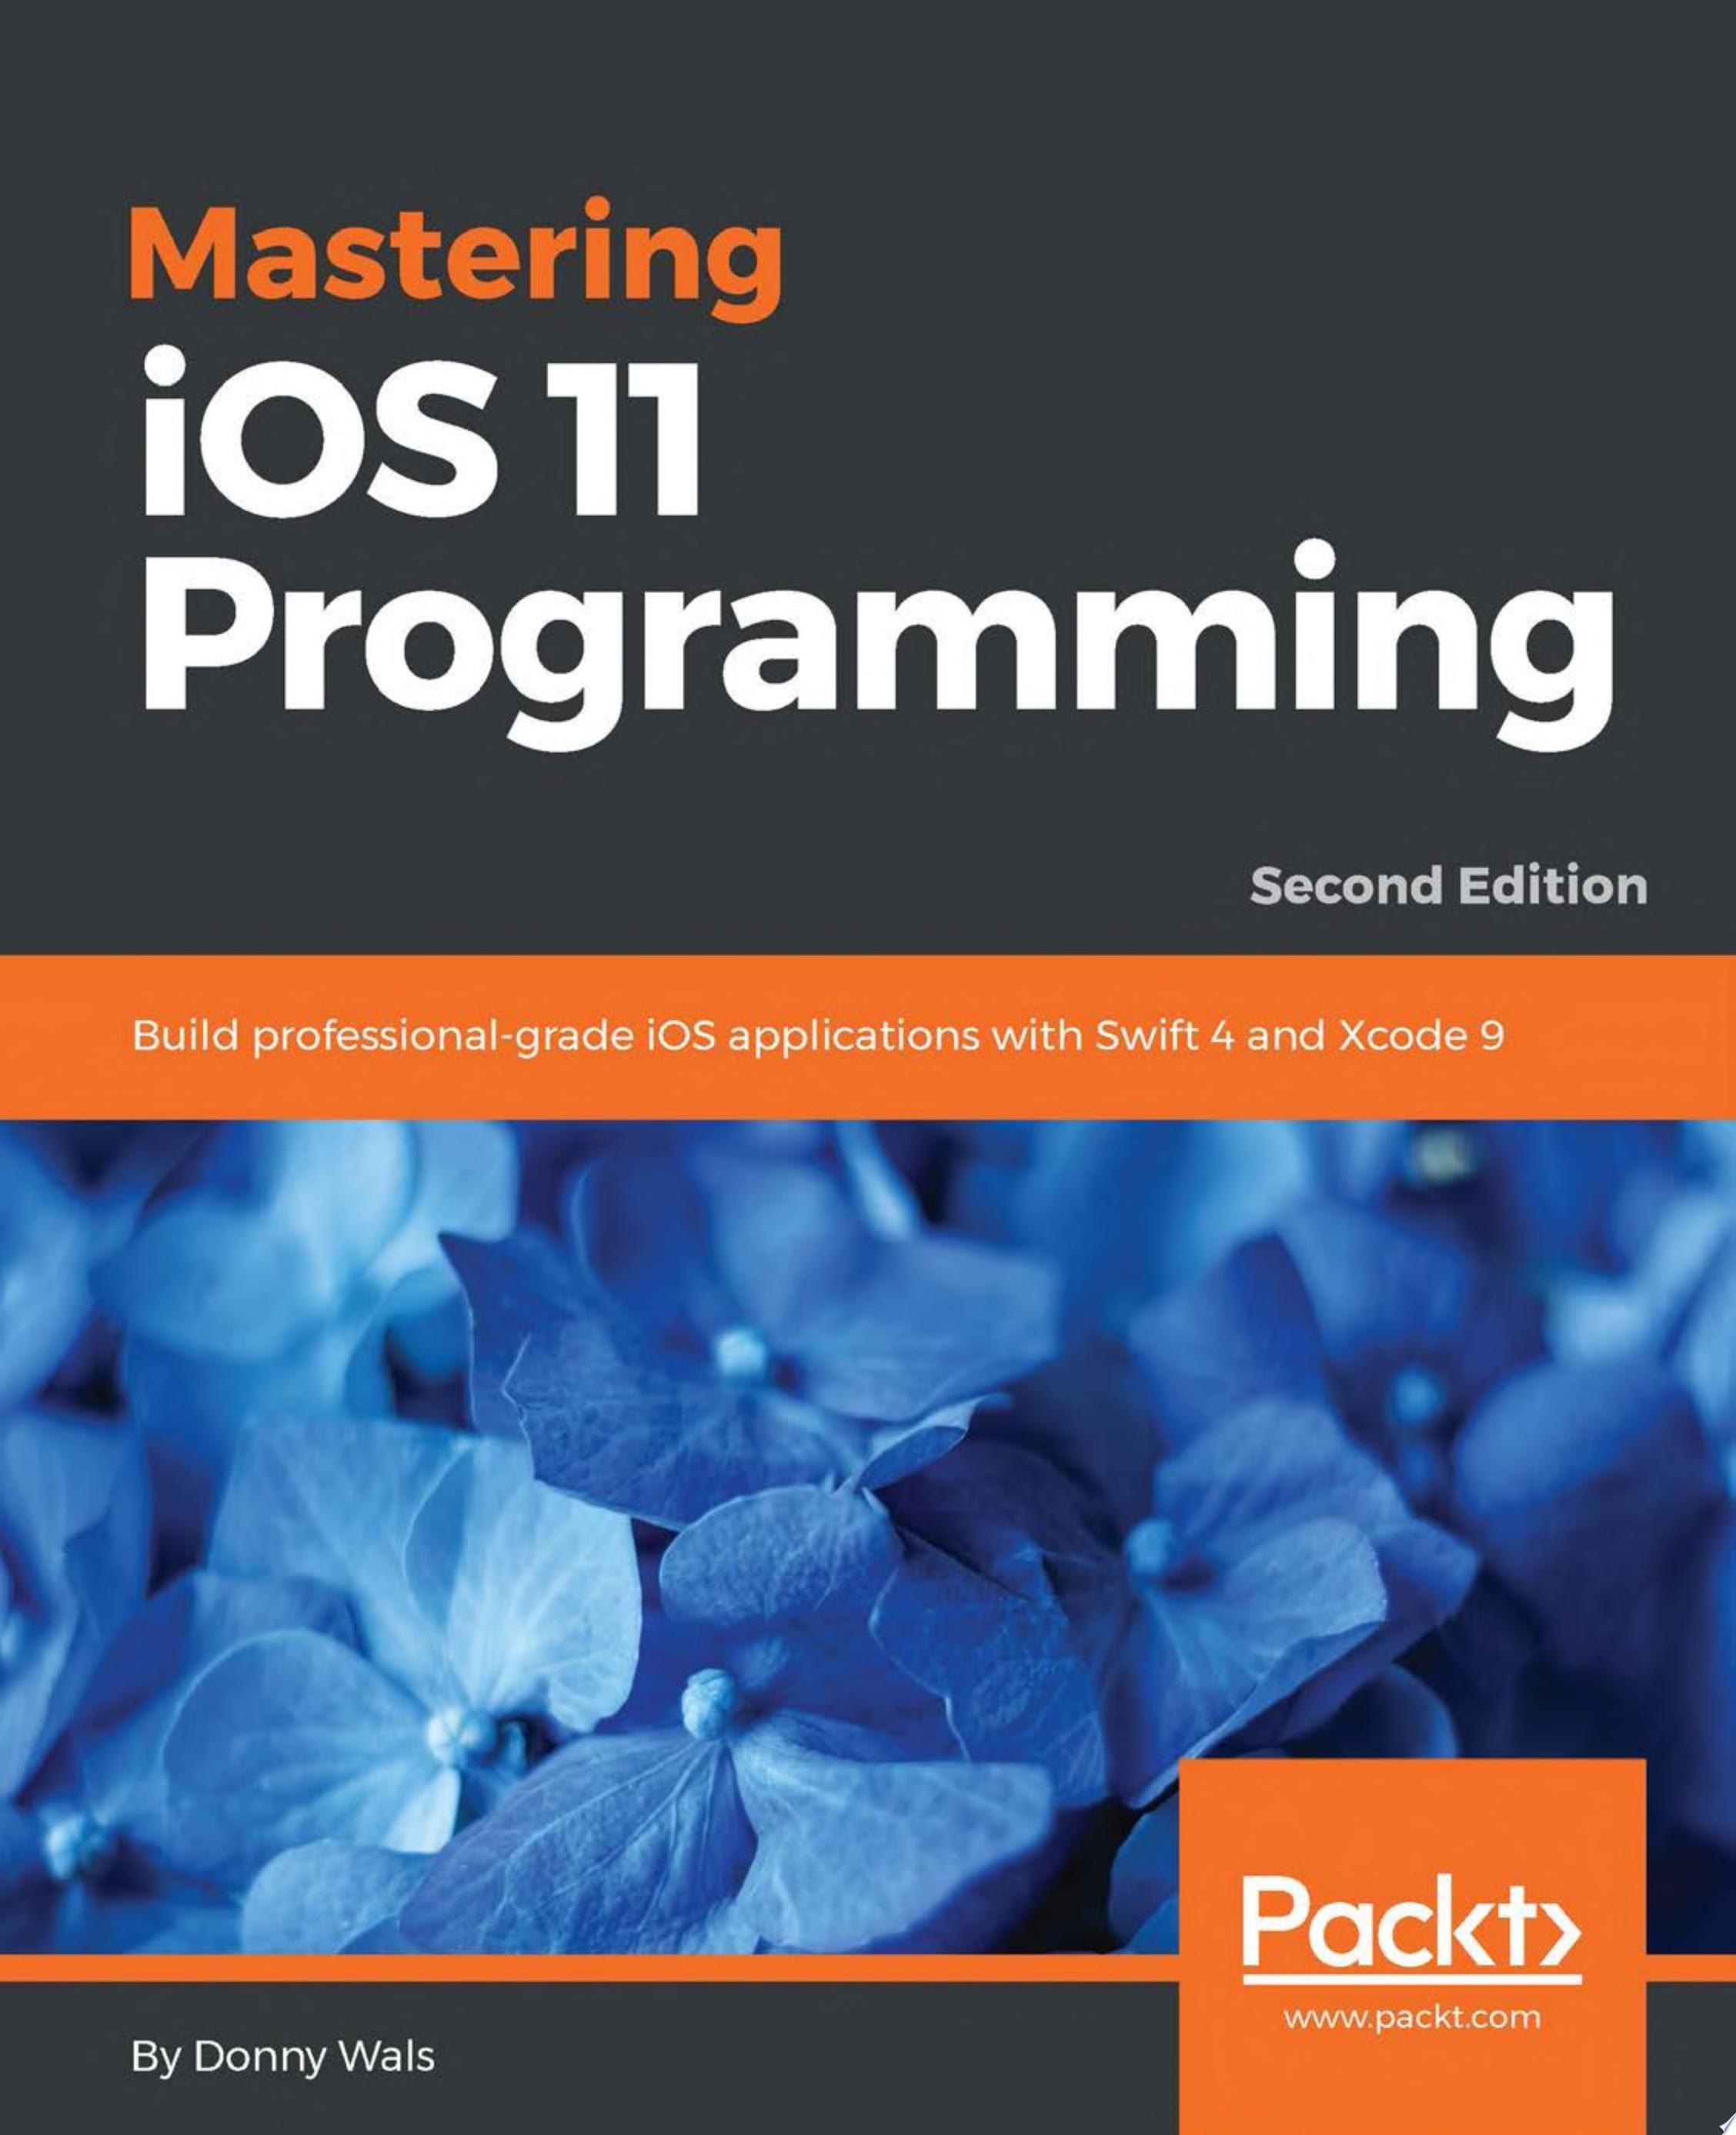 Mastering iOS 11 Programming